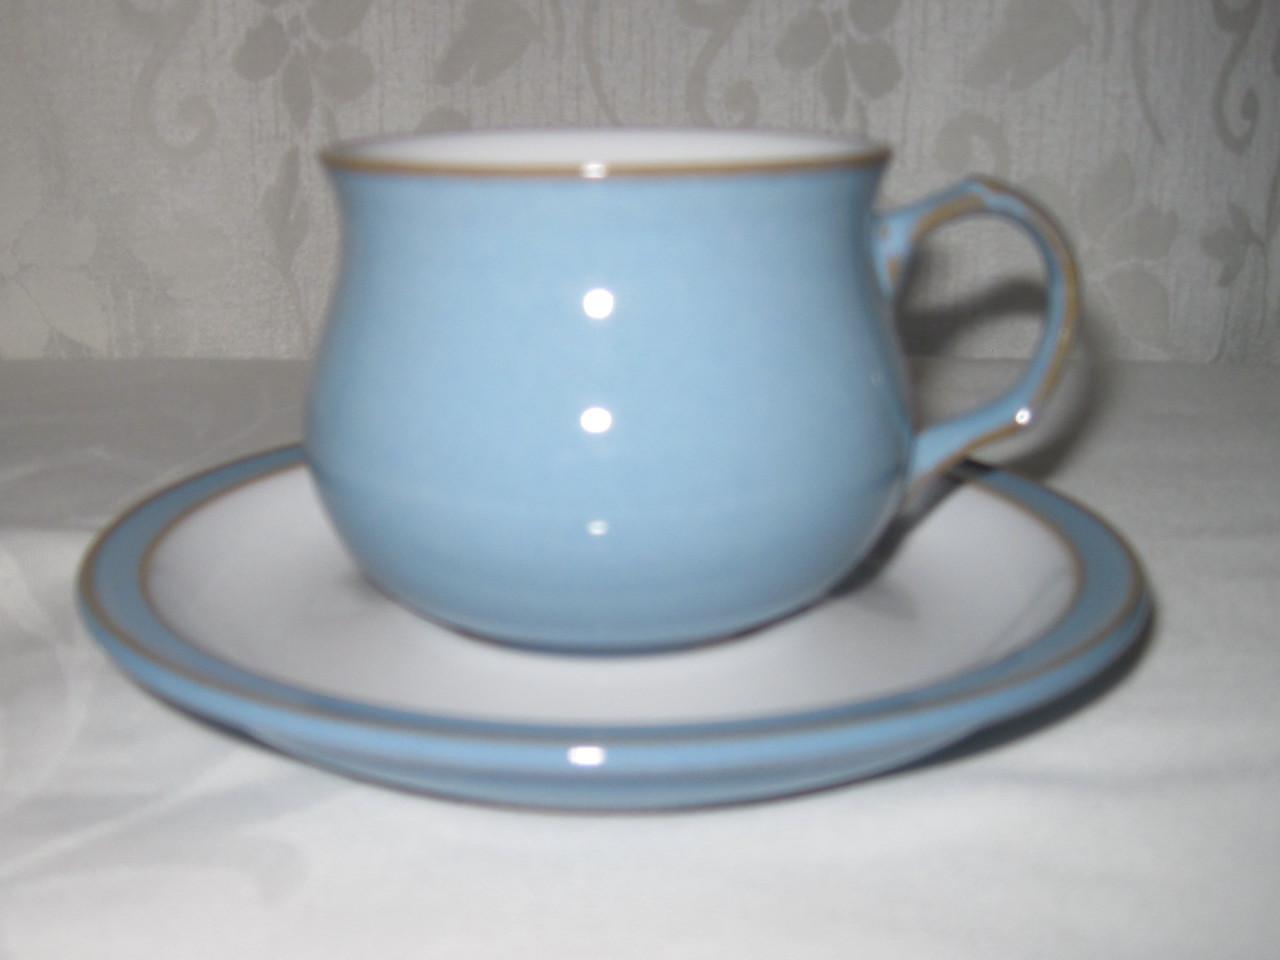 Denby Colonial Blue Dinnerware | fabfindsblog